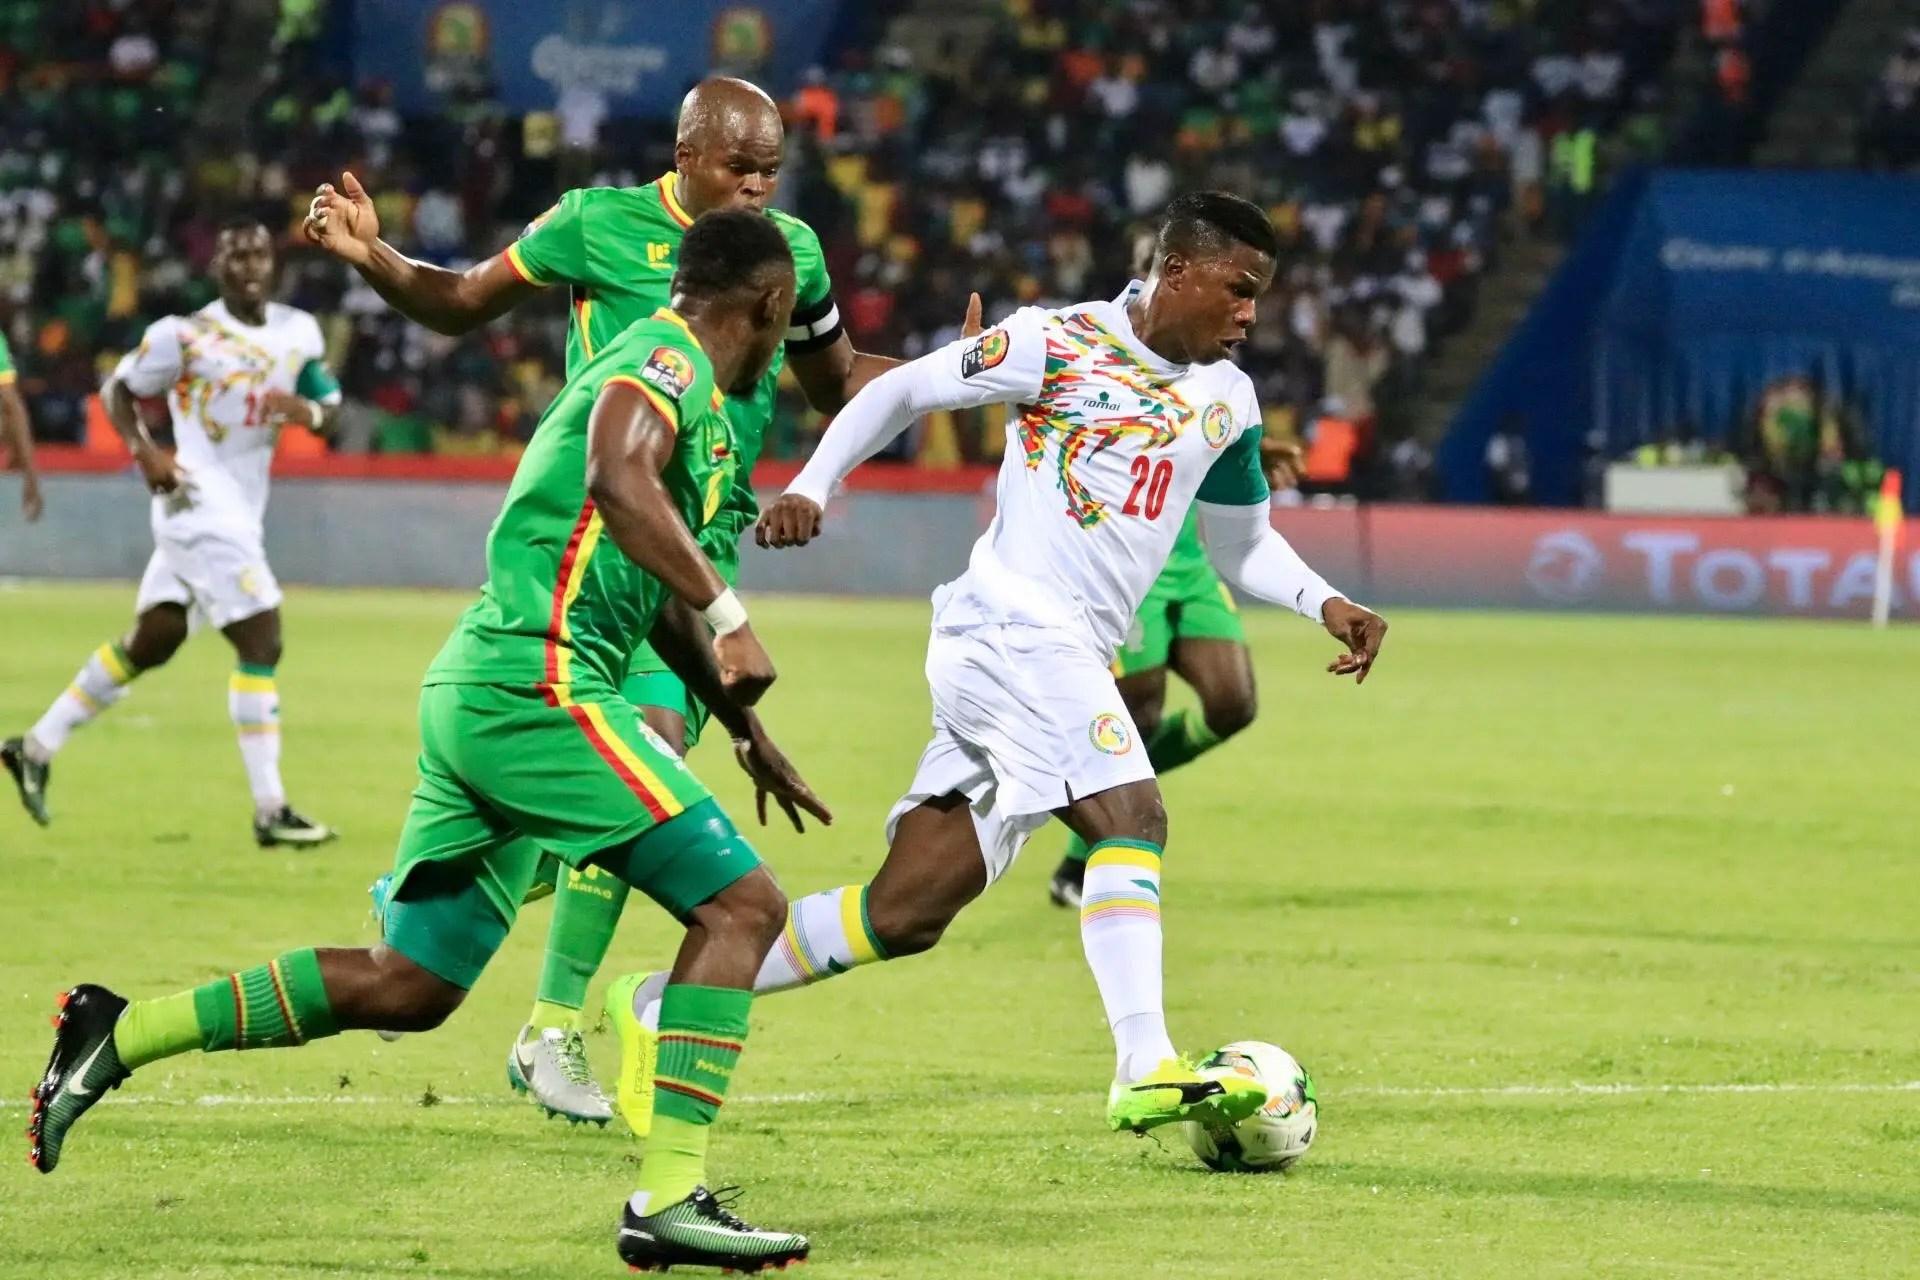 AFCON 2017: Mane, Saivet's Goals Fire Senegal Past Zimbabwe, Into Quarter-Finals